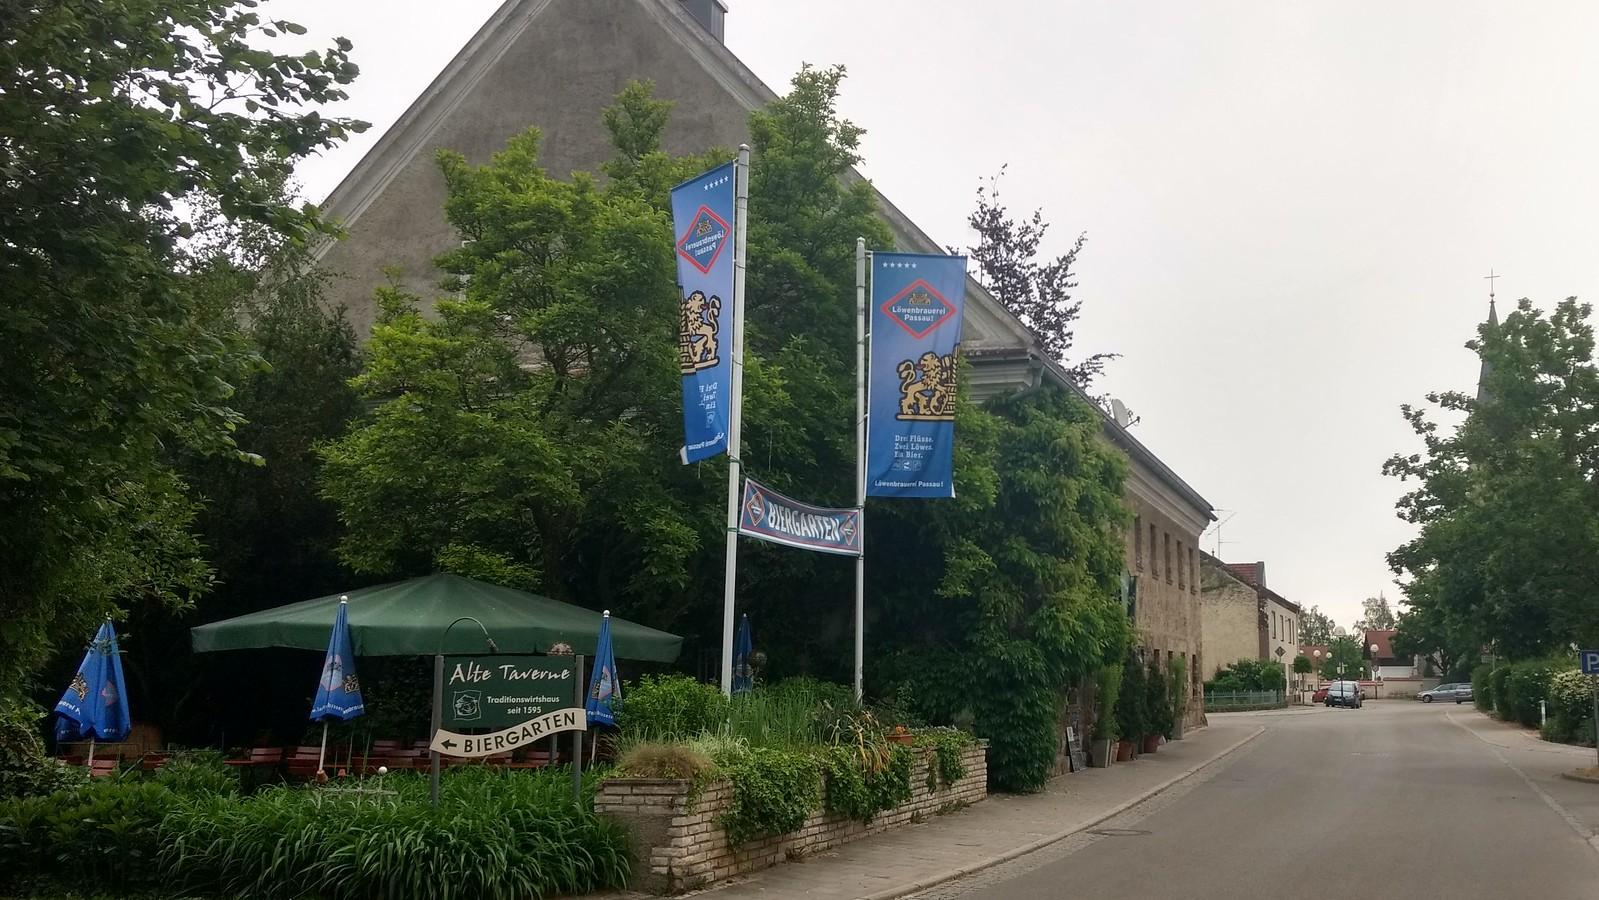 Alte Taverne in Würding